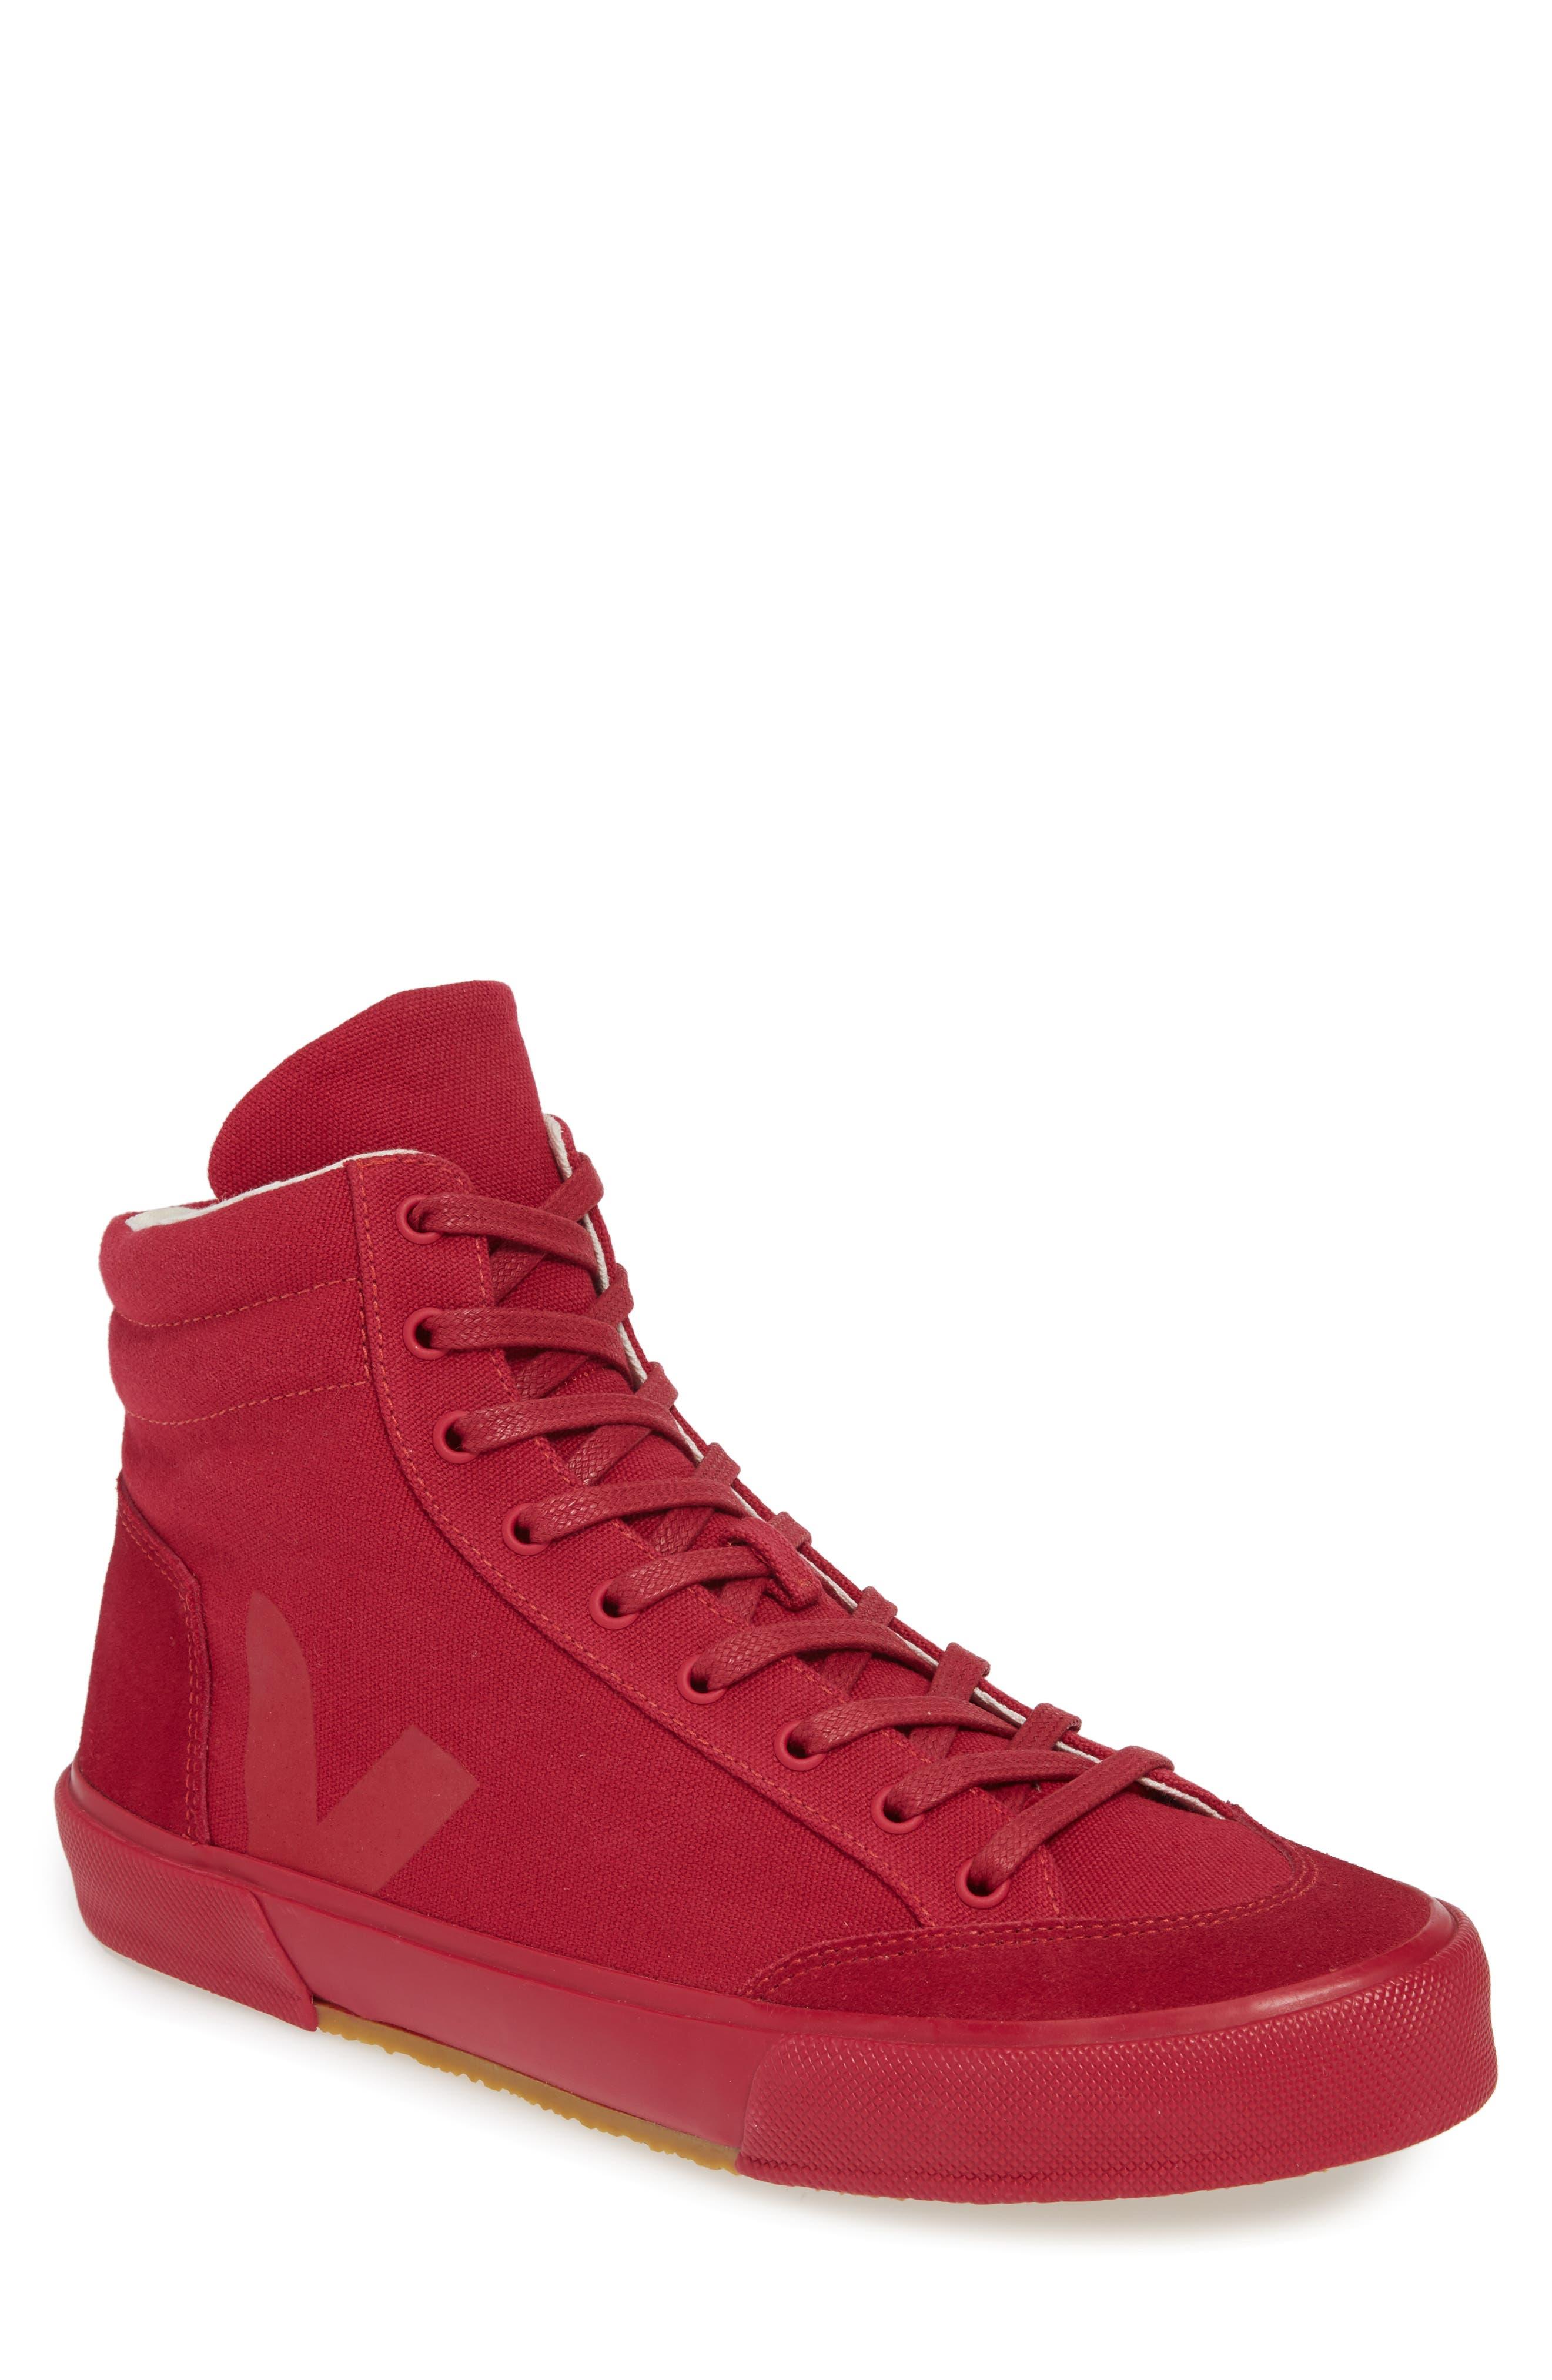 Veja X Lemaire Sneaker, US / 44EU - Red